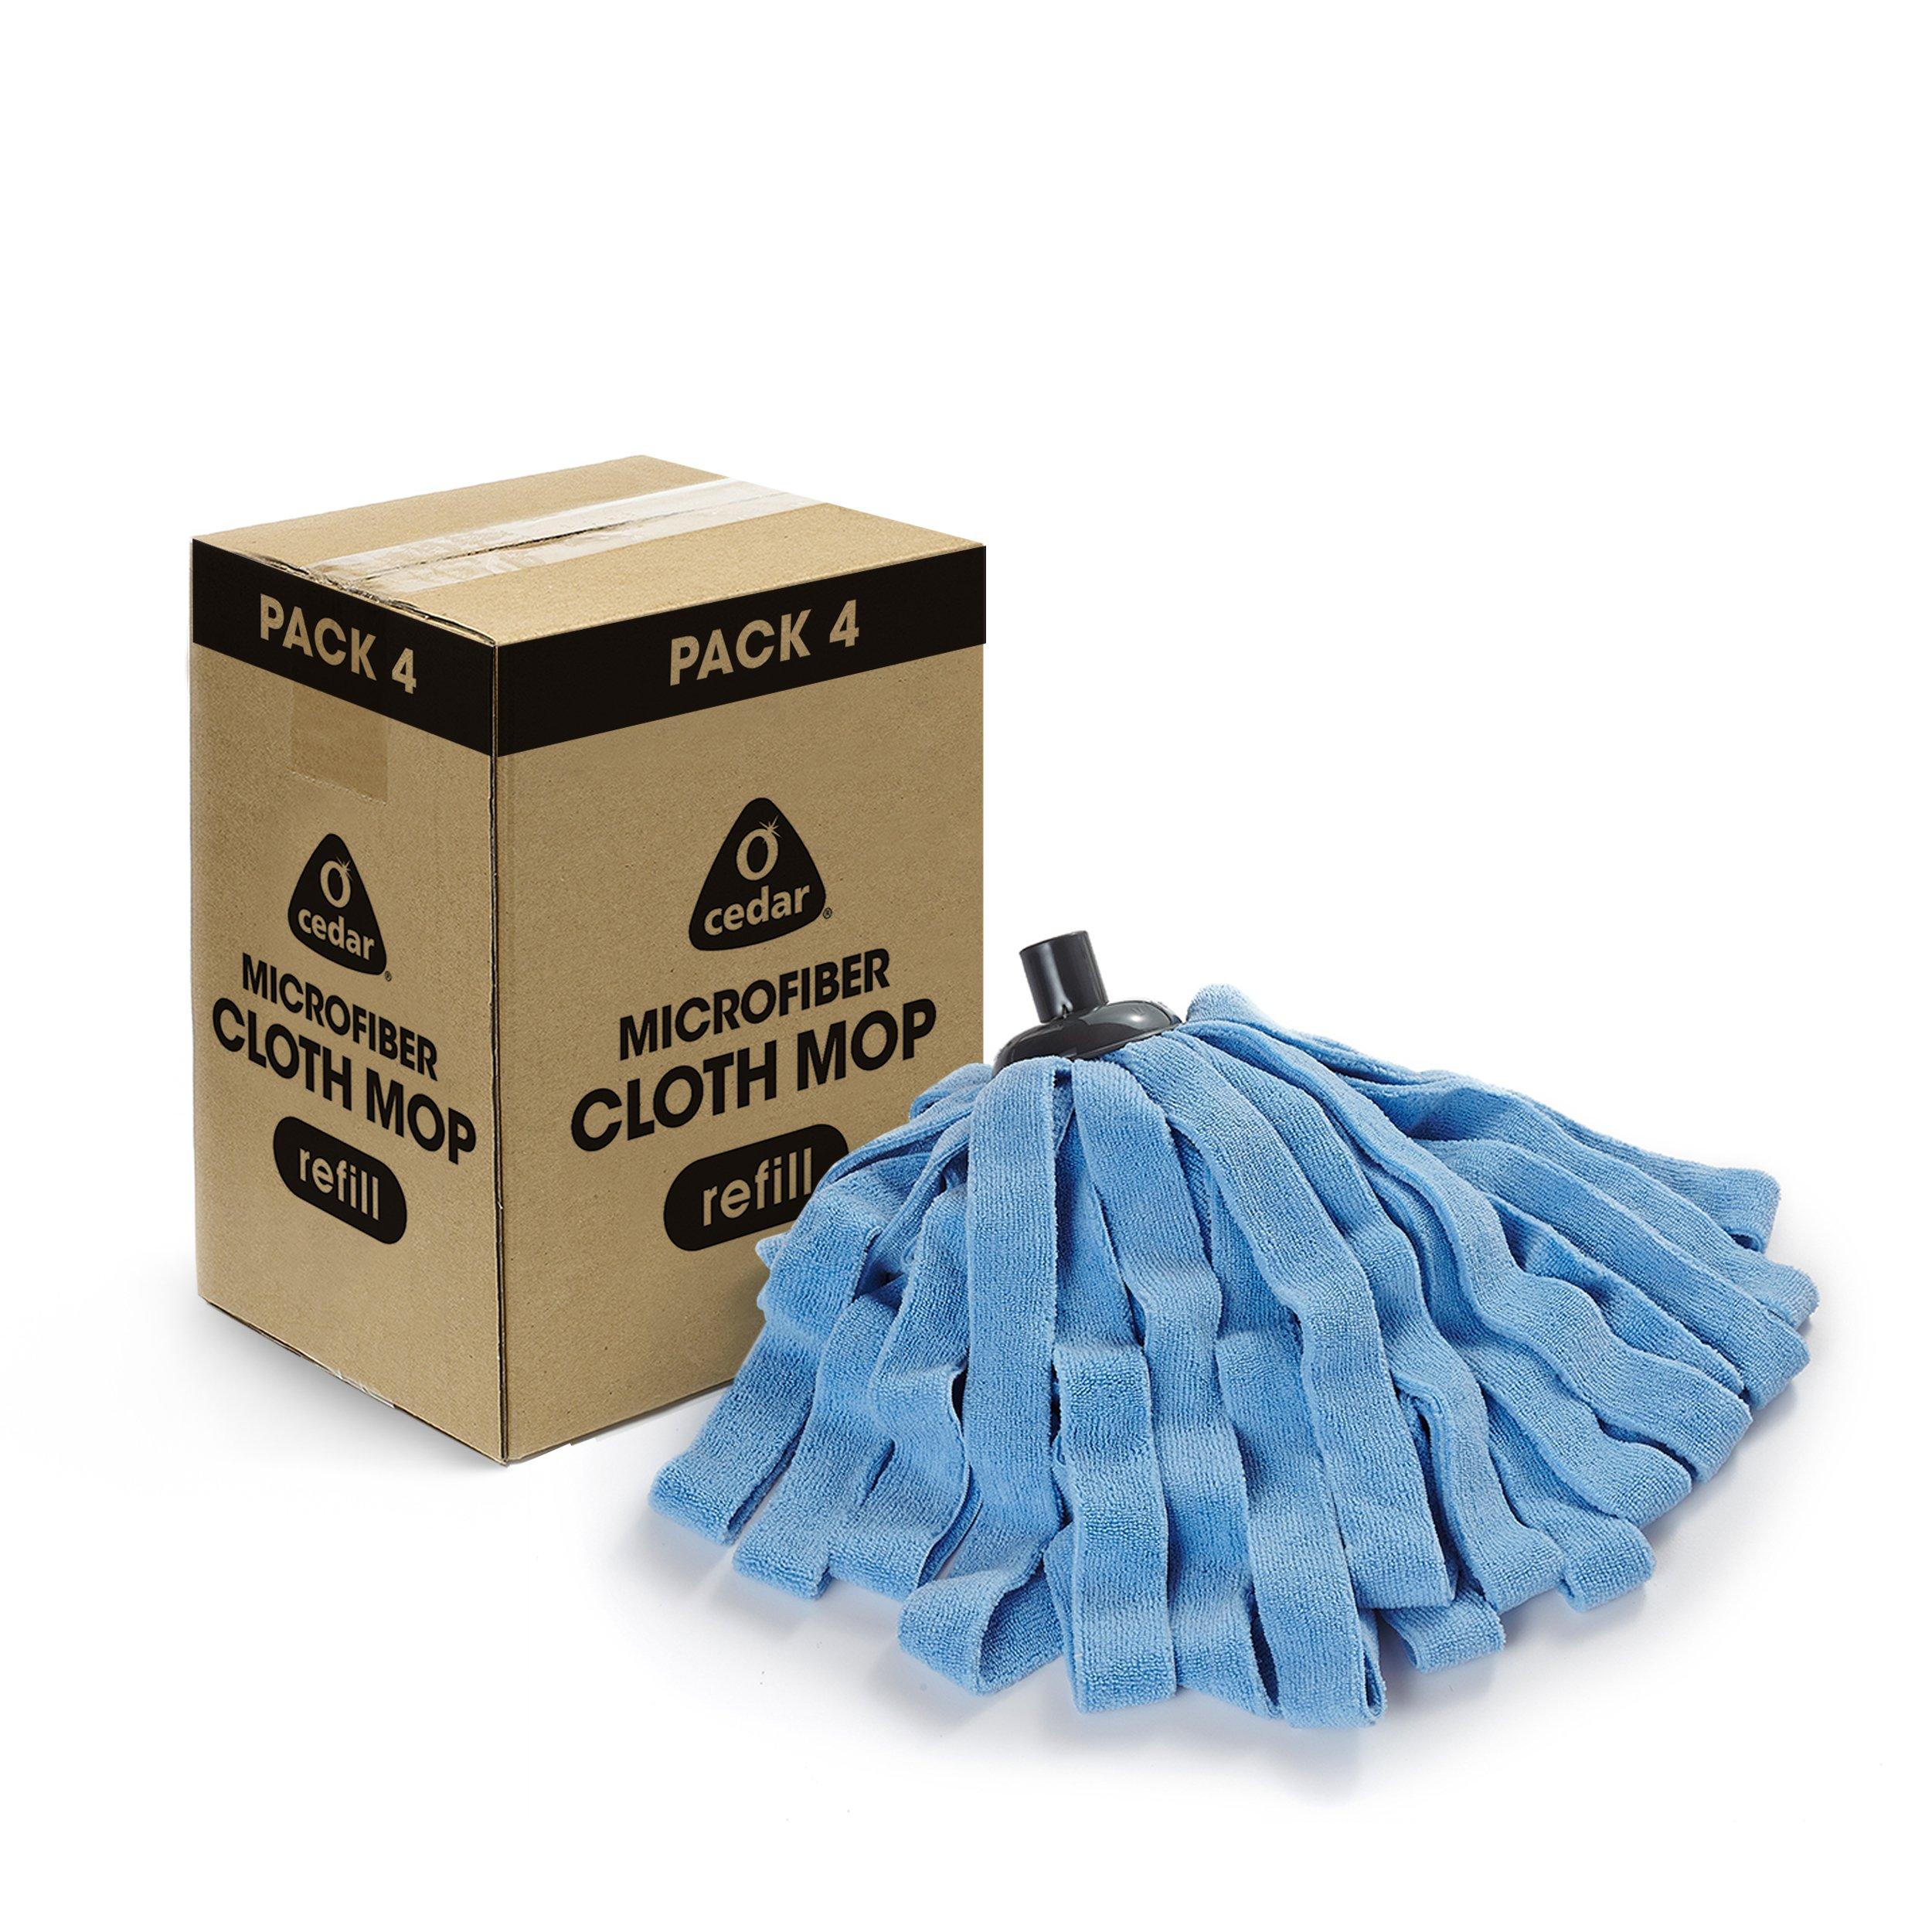 O-Cedar Microfiber Cloth Mop Refill (Pack of 4) by O-Cedar (Image #1)